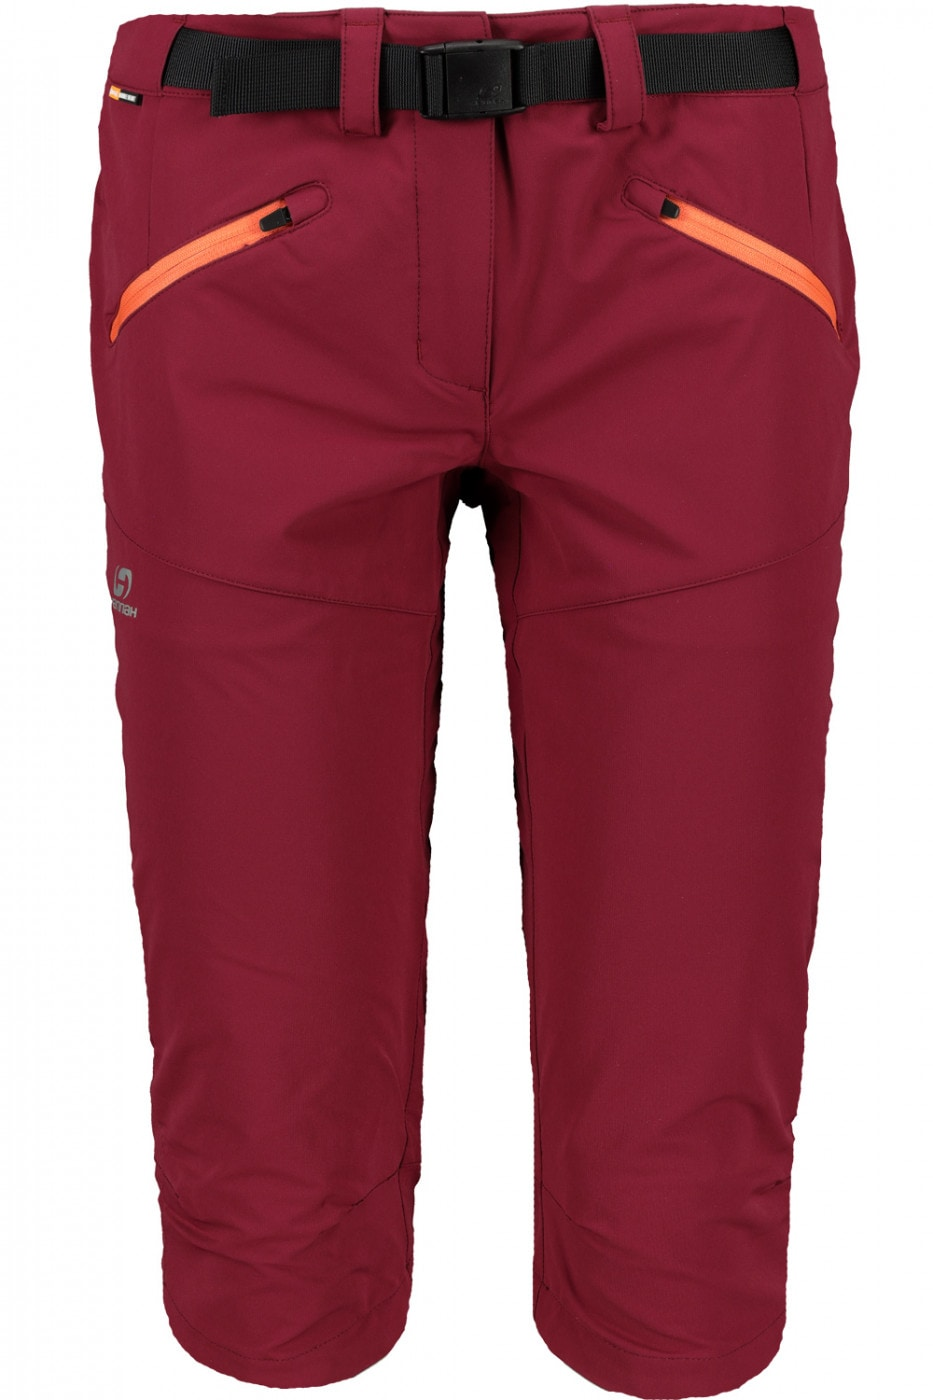 Women's outdoor 3/4 pants HANNAH Row